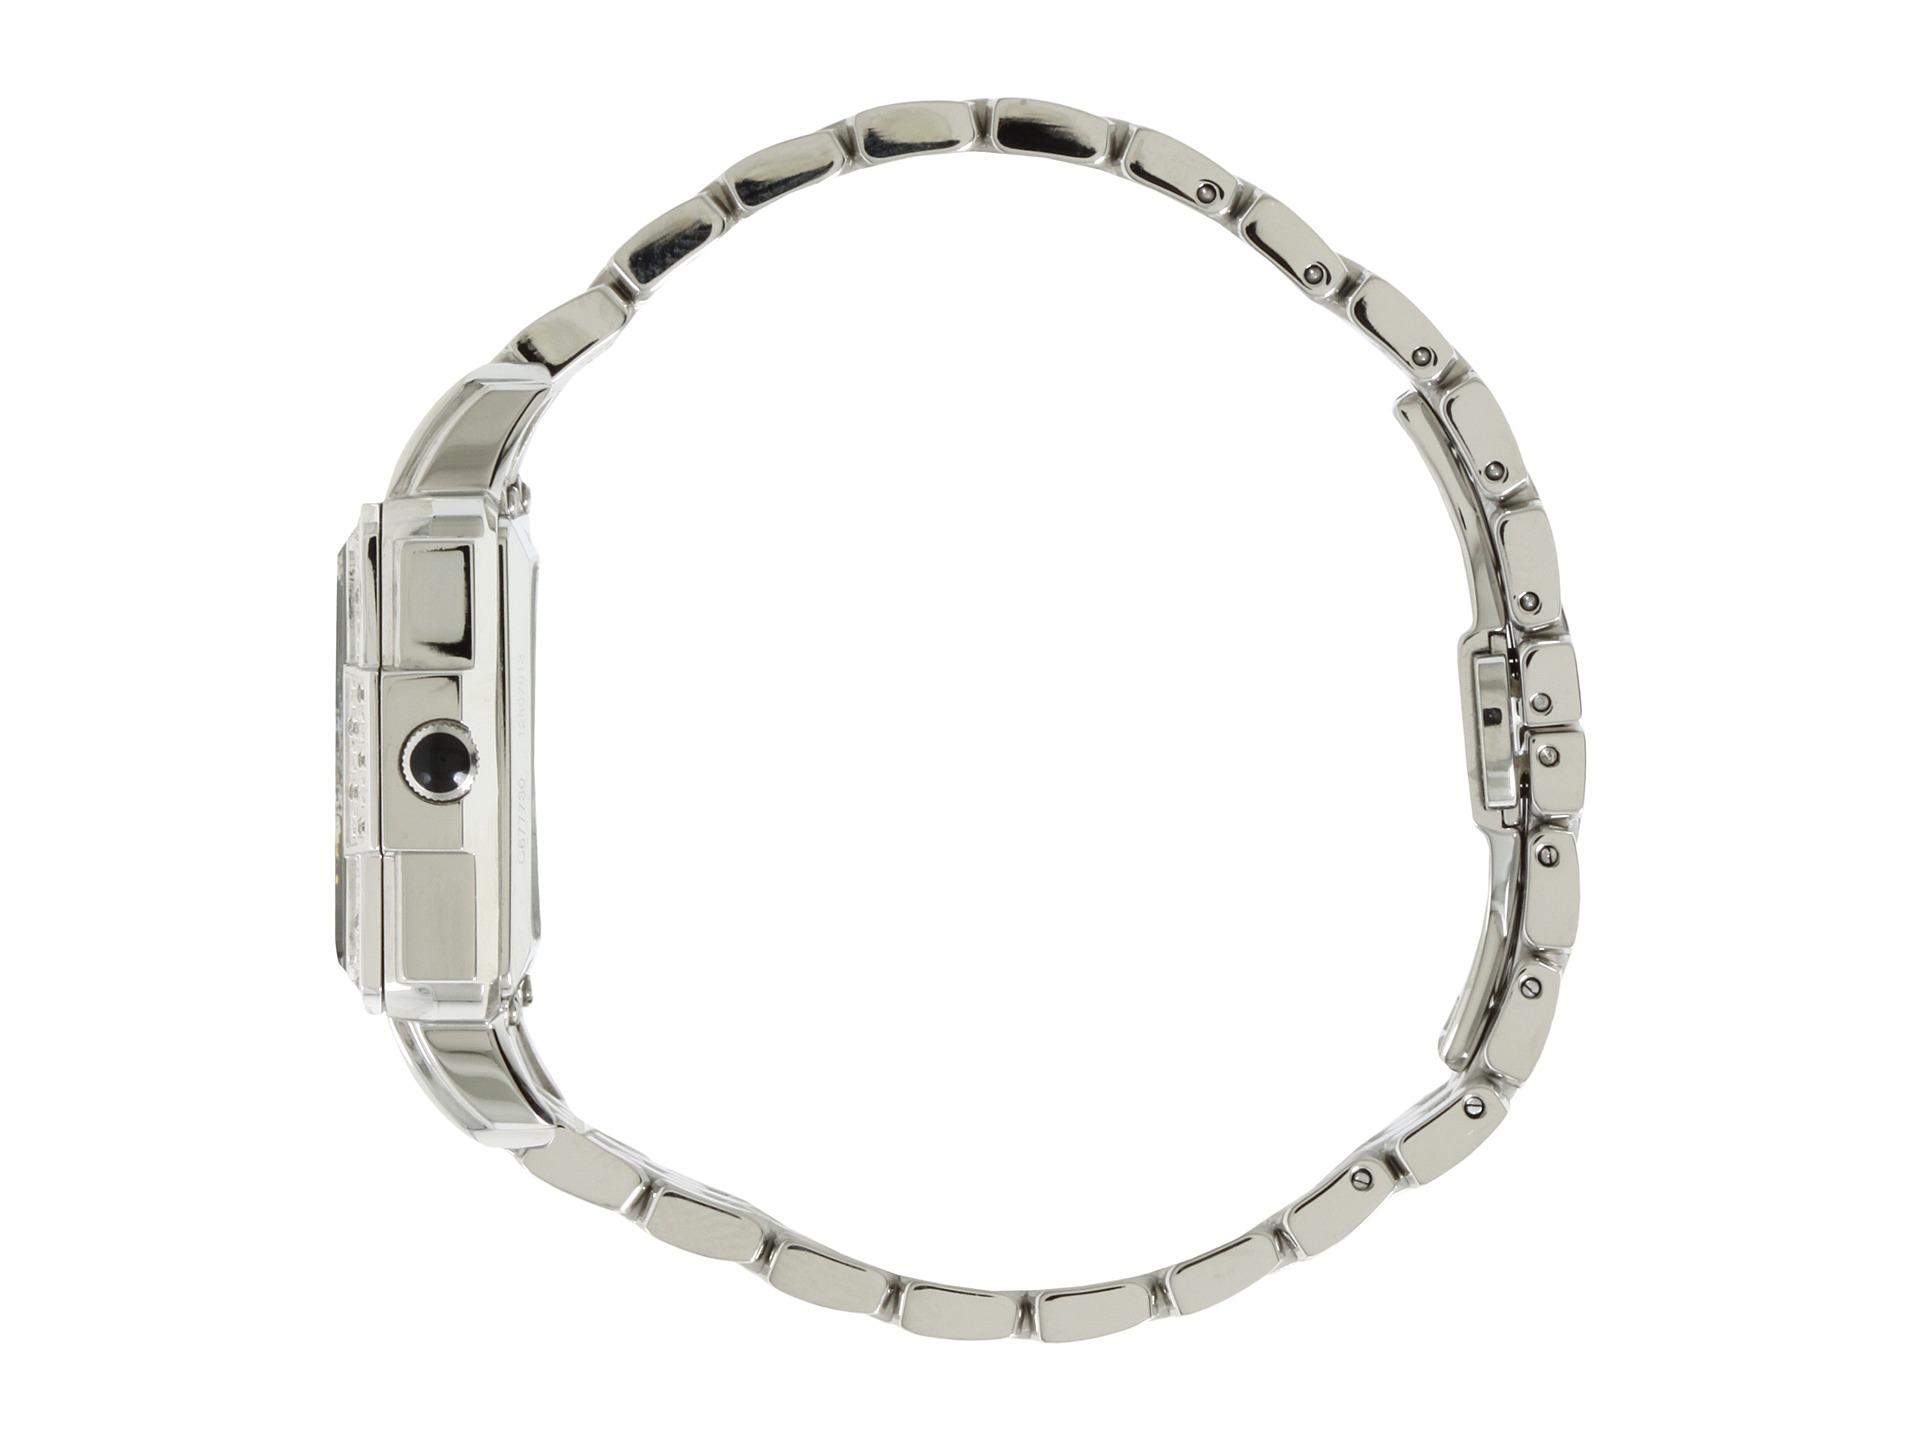 Bulova Ladies Mechanical 96r155 White